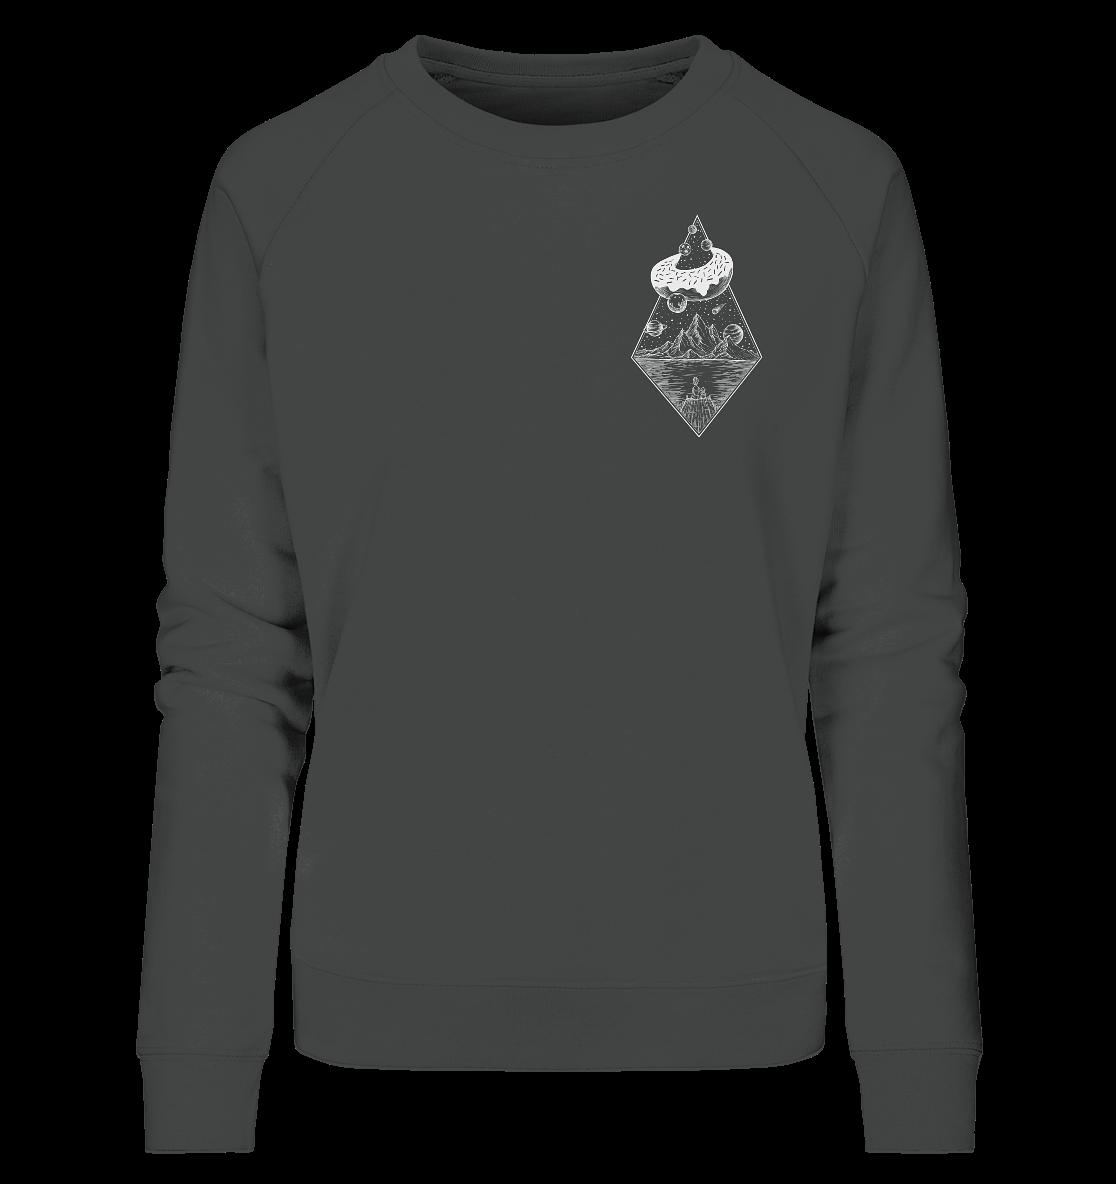 front-ladies-organic-sweatshirt-444545-1116x.png